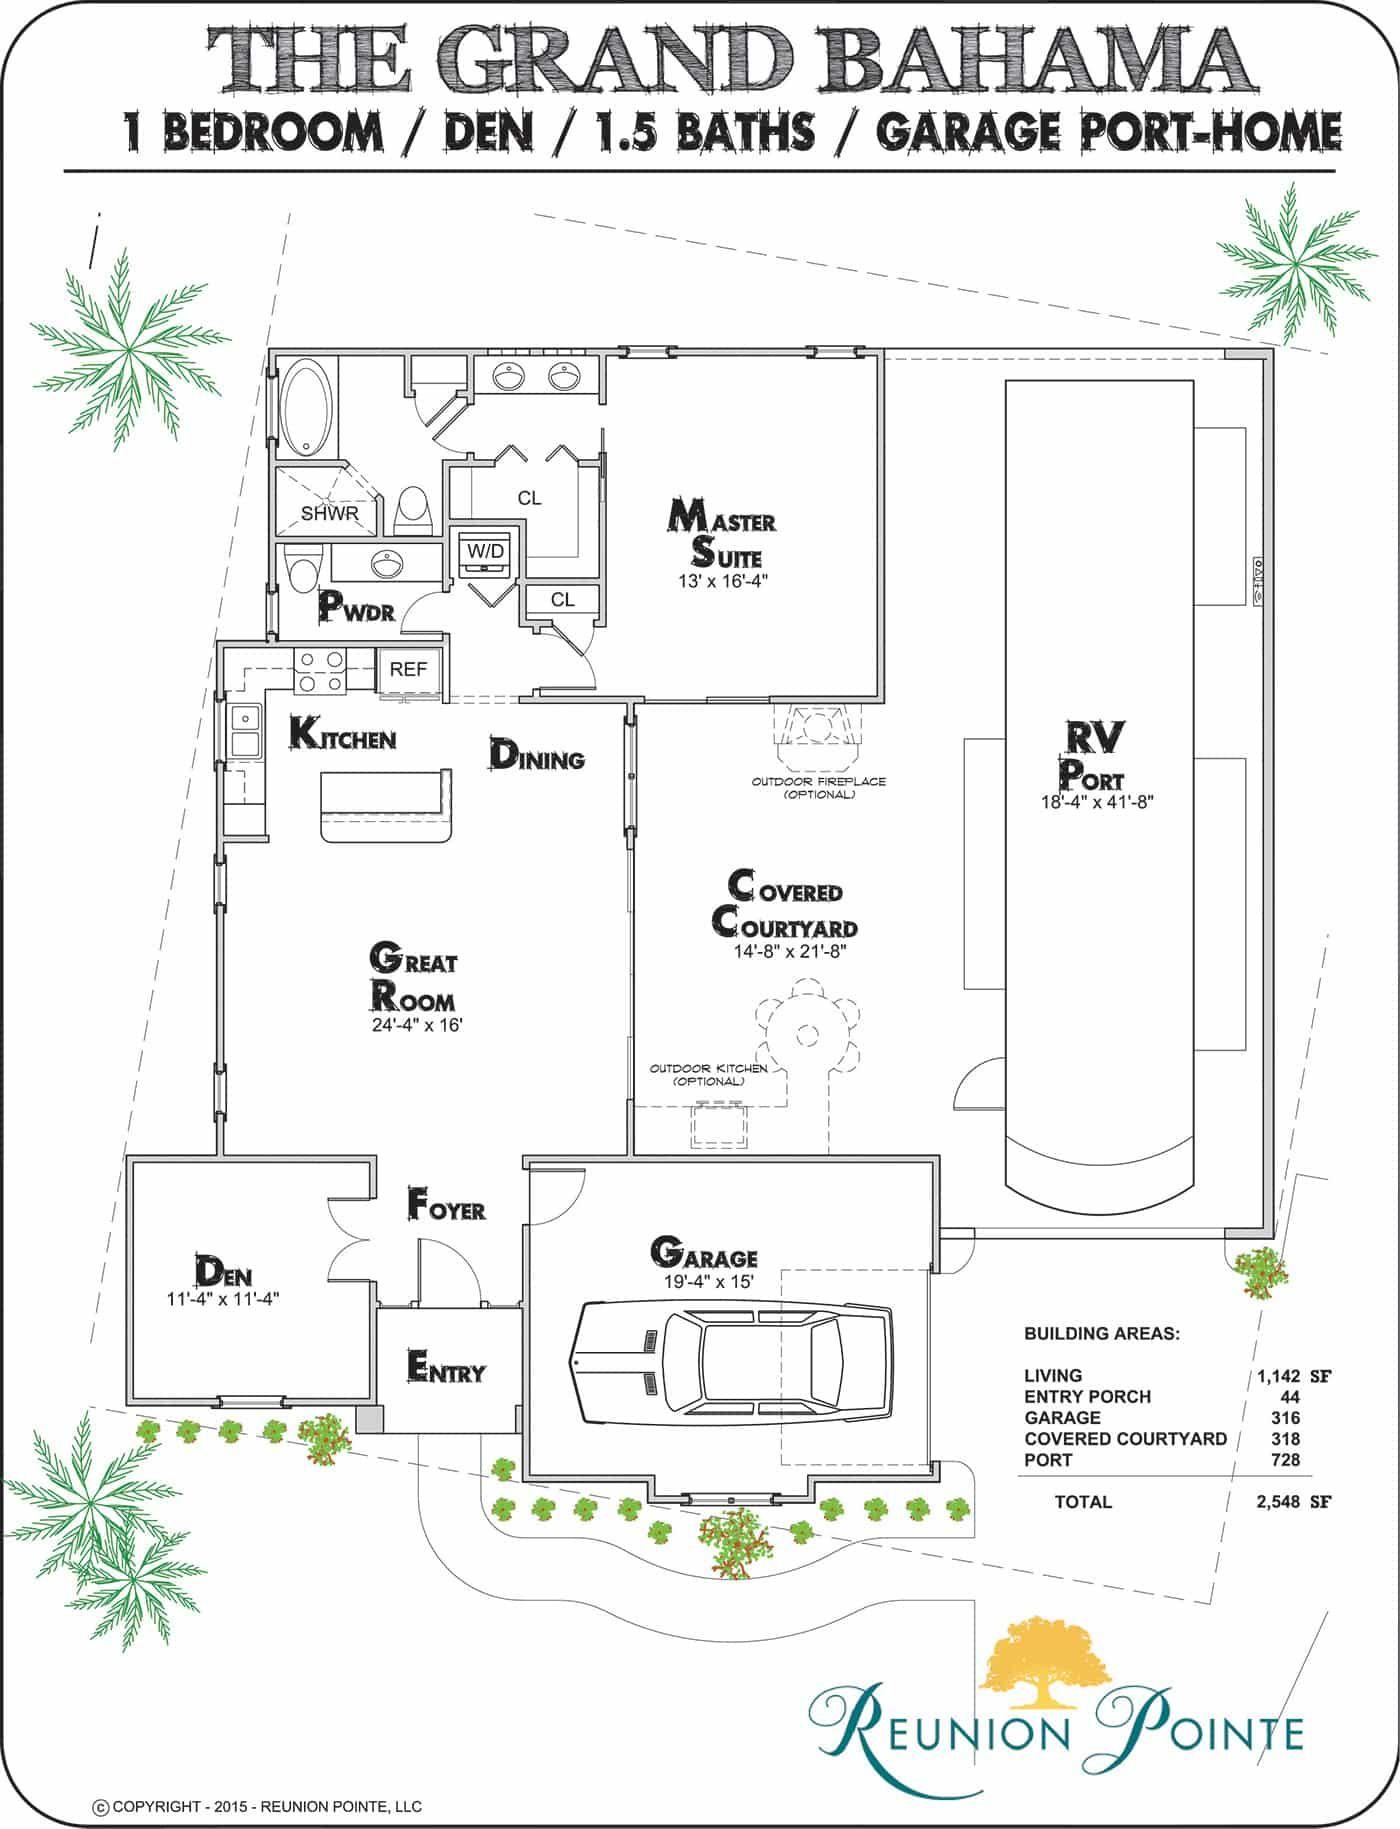 Grand Bahama Rv Port Home Model Floorplan Grand Bahama House Floor Plans Garage House Plans